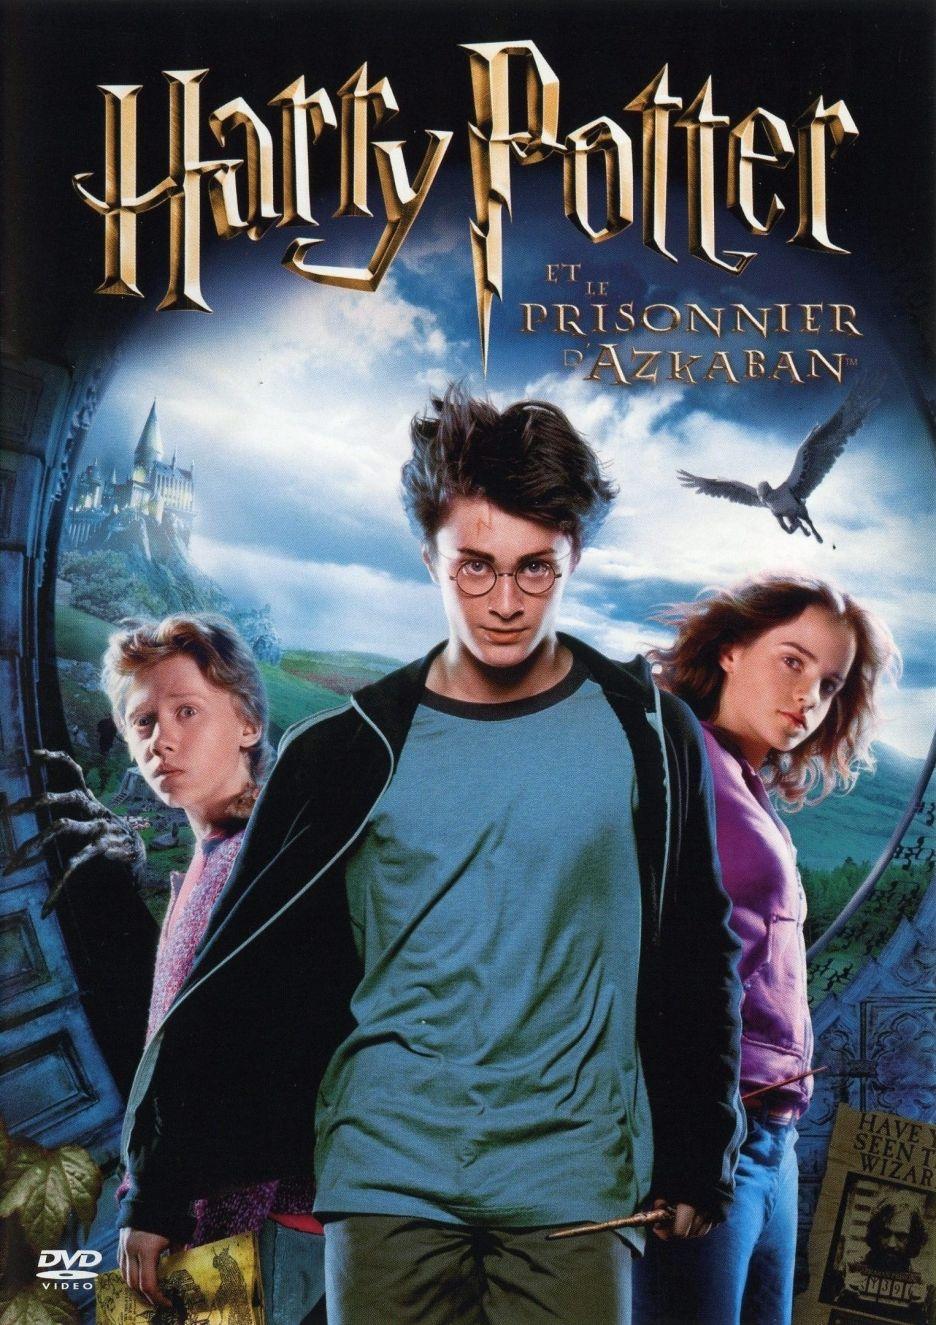 Harry Potter And The Prisoner Of Azkaban Harry Potter Movies Prisoner Of Azkaban Harry Potter Film